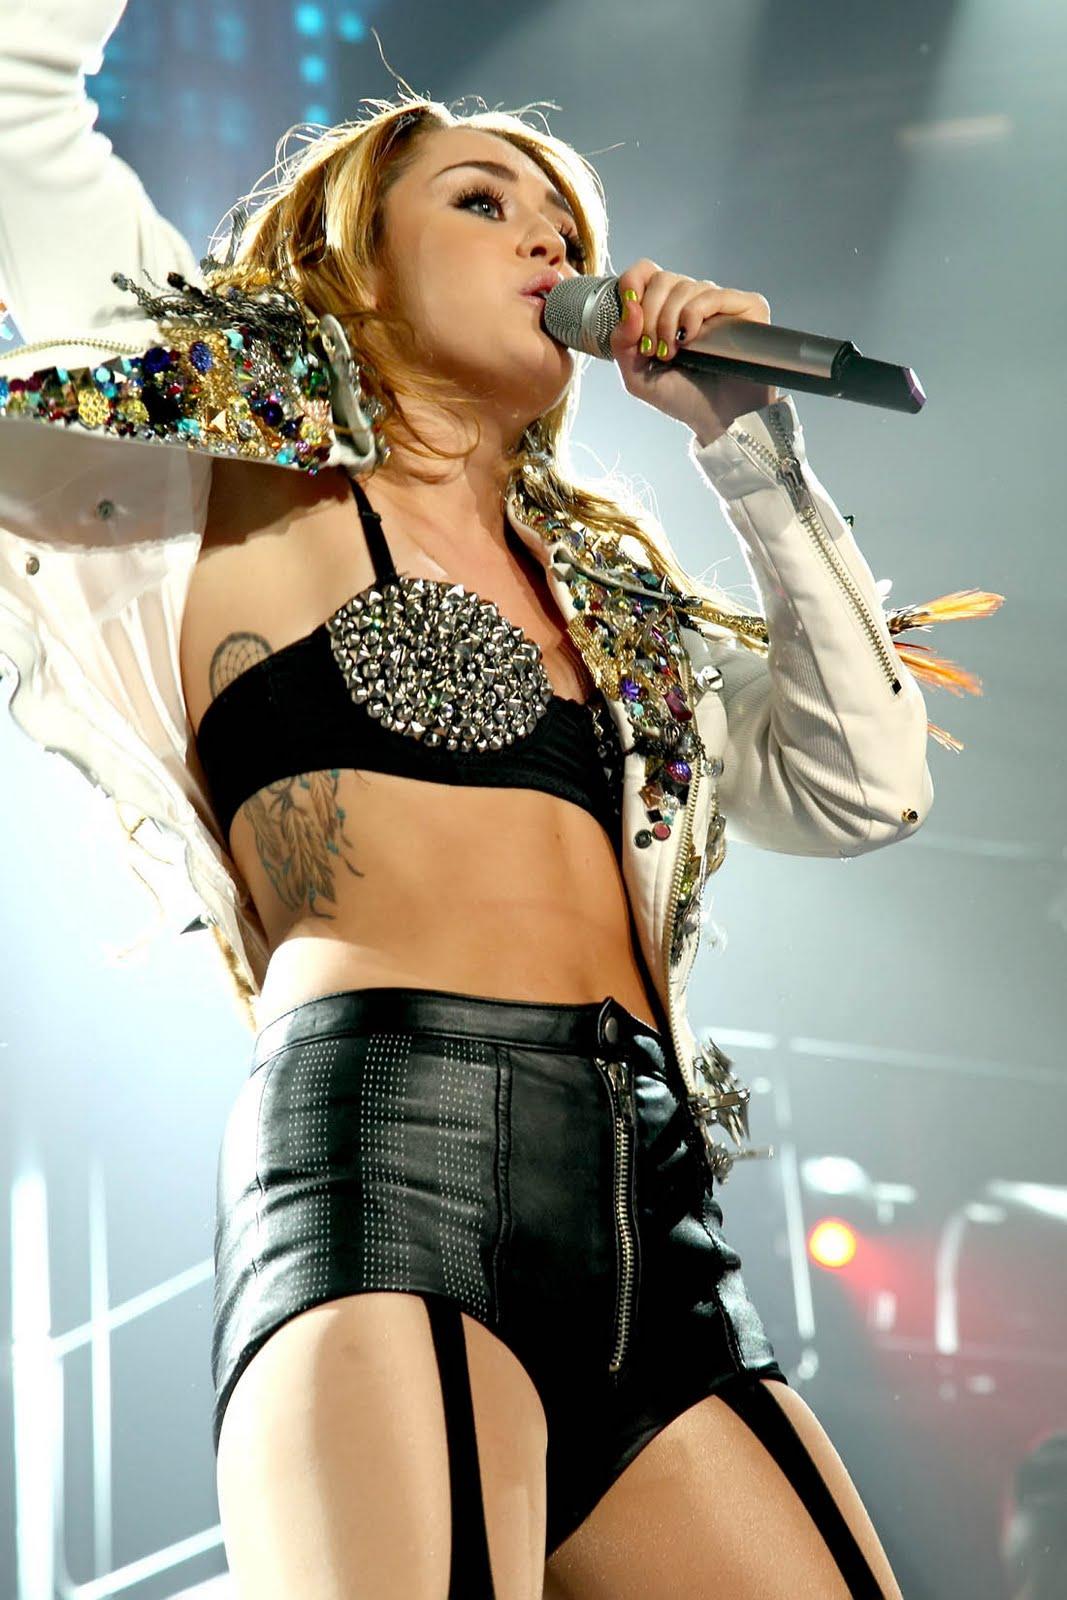 Consider, Miley cyrus upskirt concert